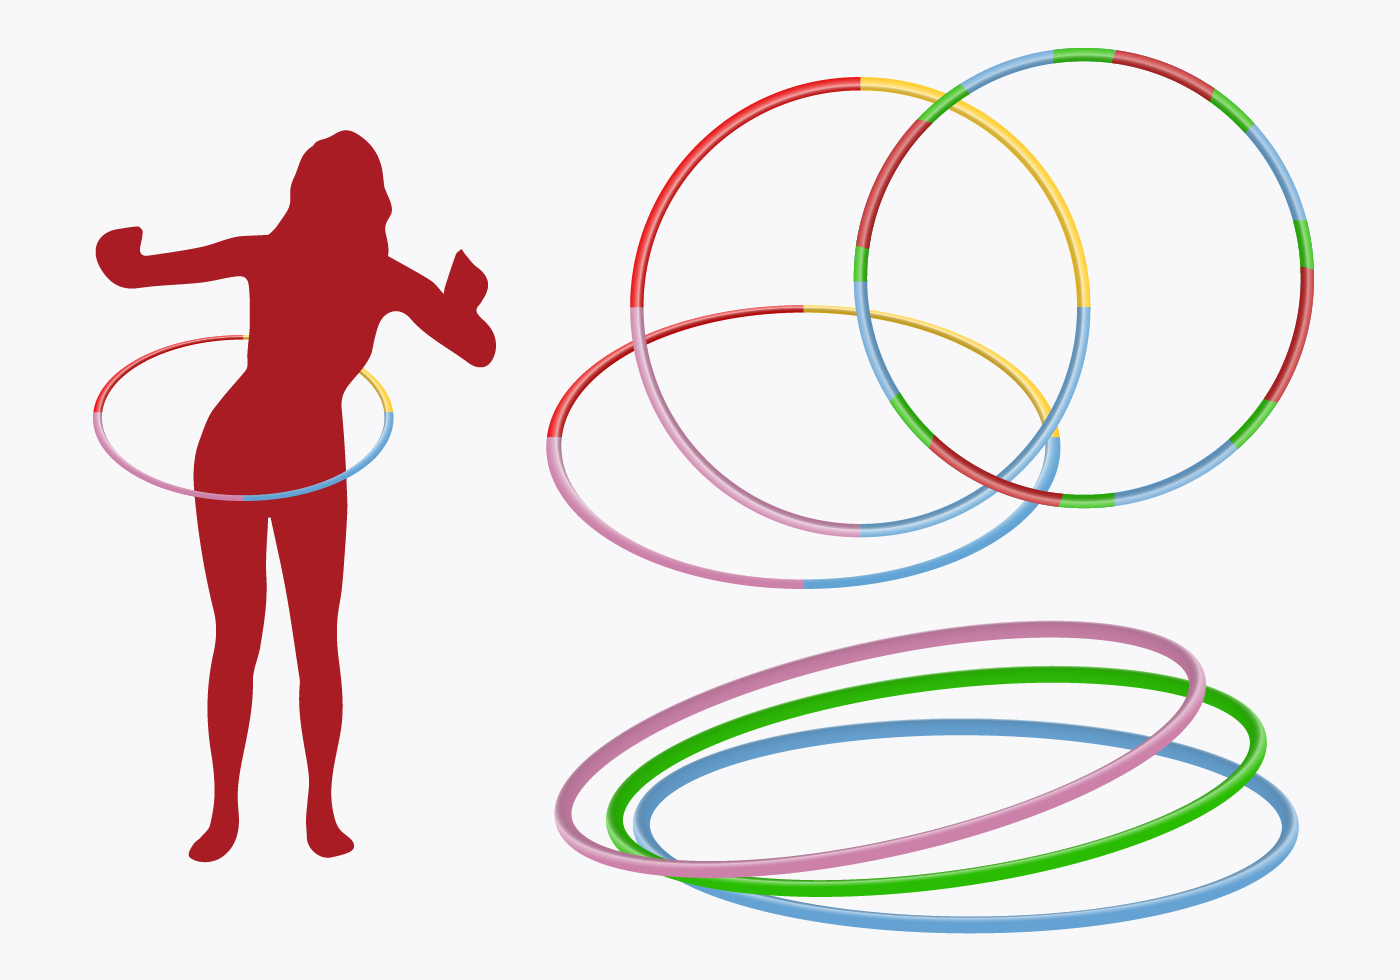 hula hoop girl vector download free vector art stock graphics images. Black Bedroom Furniture Sets. Home Design Ideas